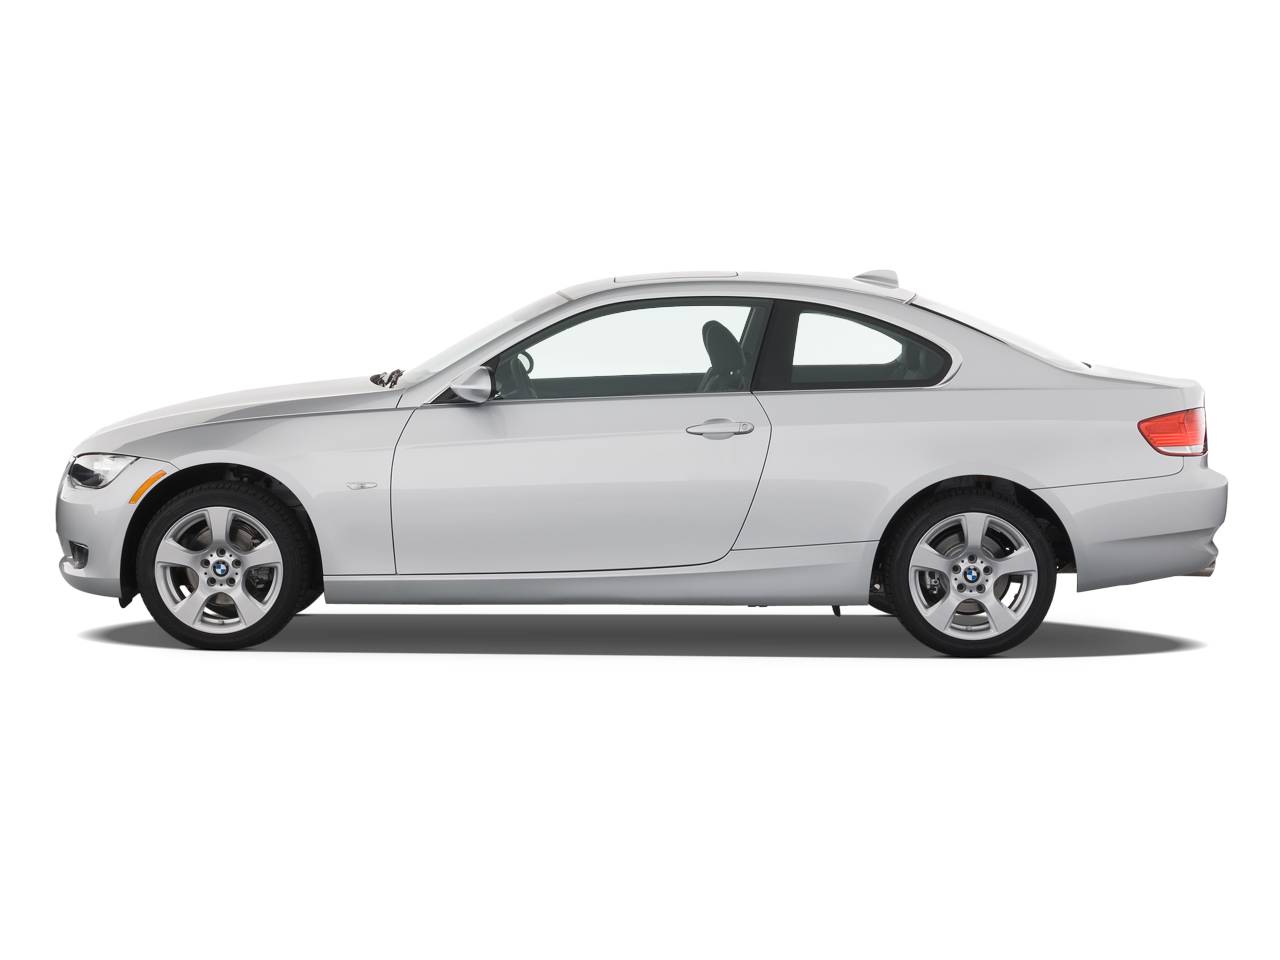 2009 Bmw 335i Vs 2010 Audi S4 Luxury Sport Sedan Comparison